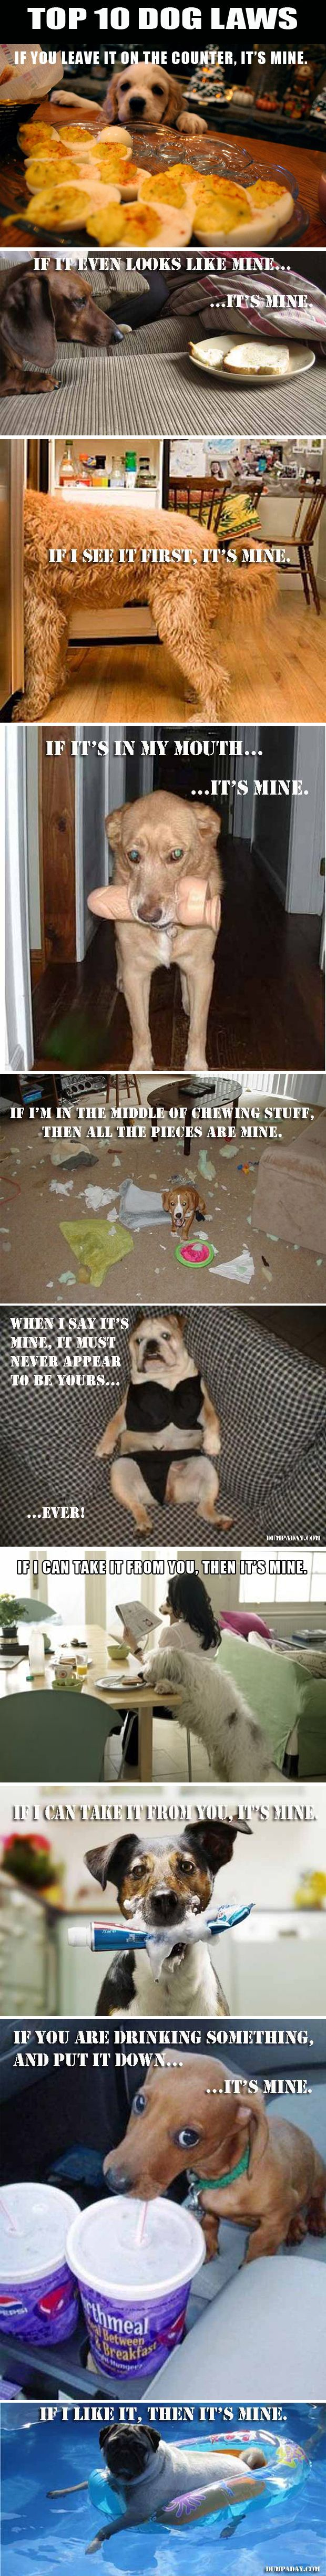 Funny Dog Laws – 10 Pics